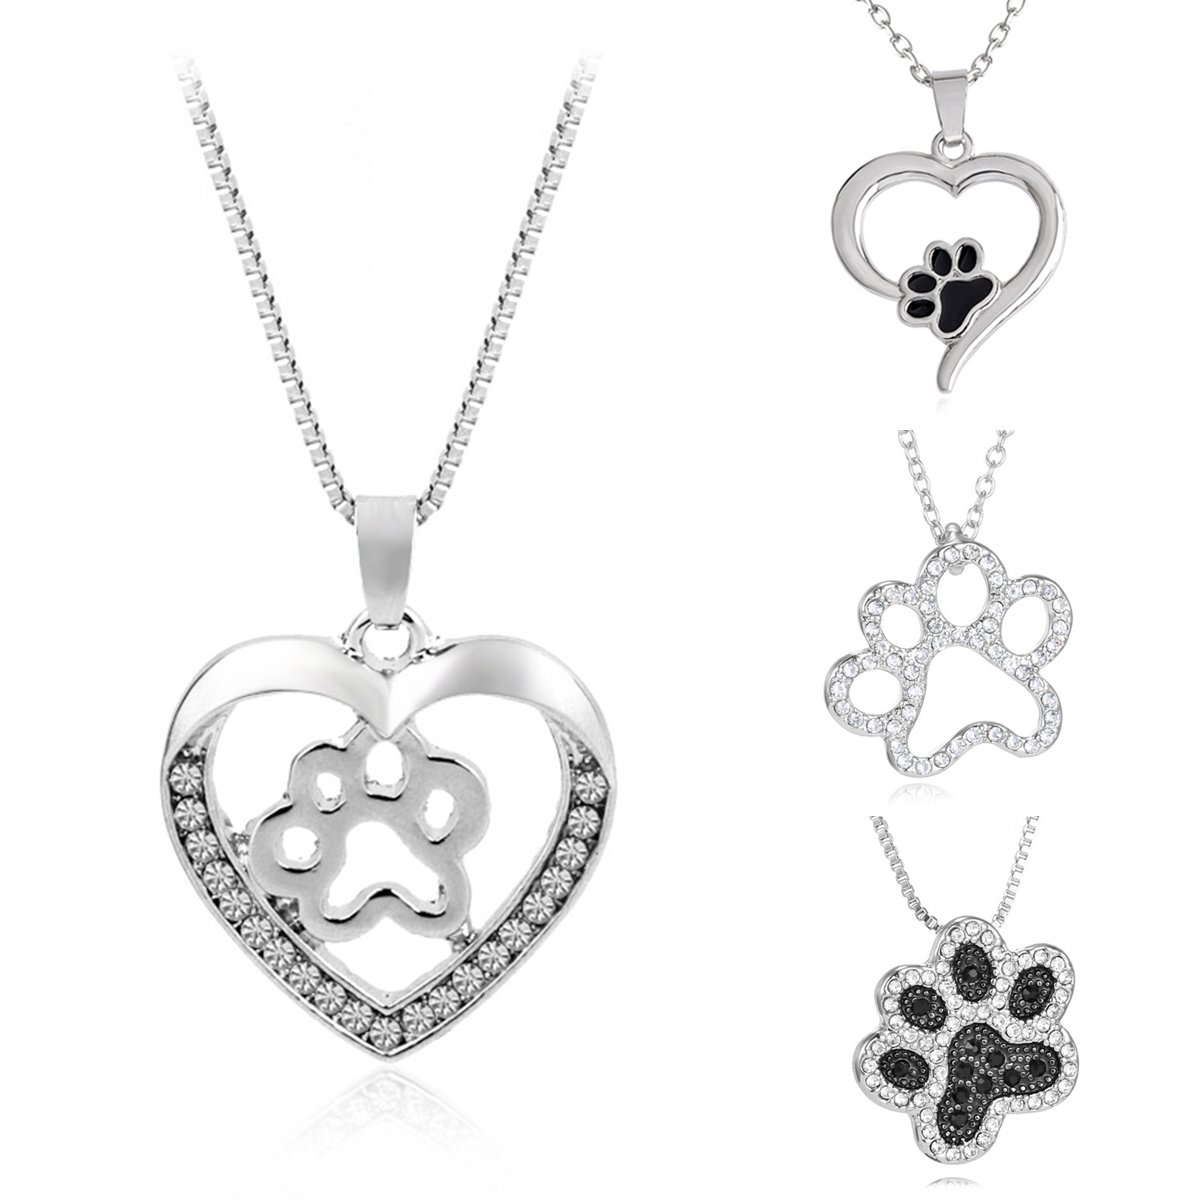 Silver Crystal Animal Memorial Dog Necklaces Dogpaw